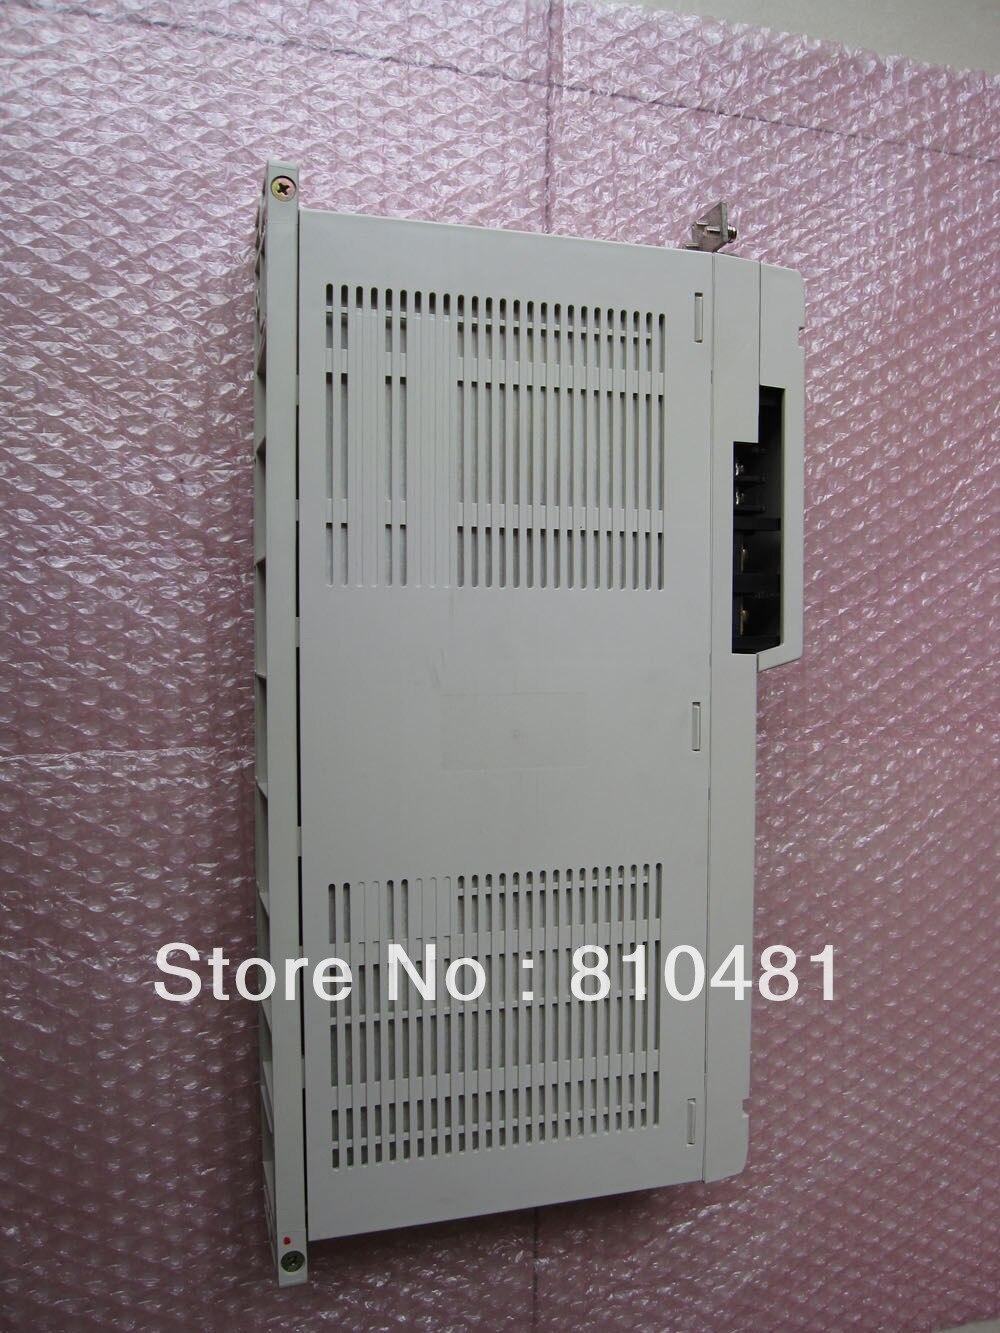 Mds B V2 1010 Mitsubishi Servo Driver Digunakan Di Elektronik